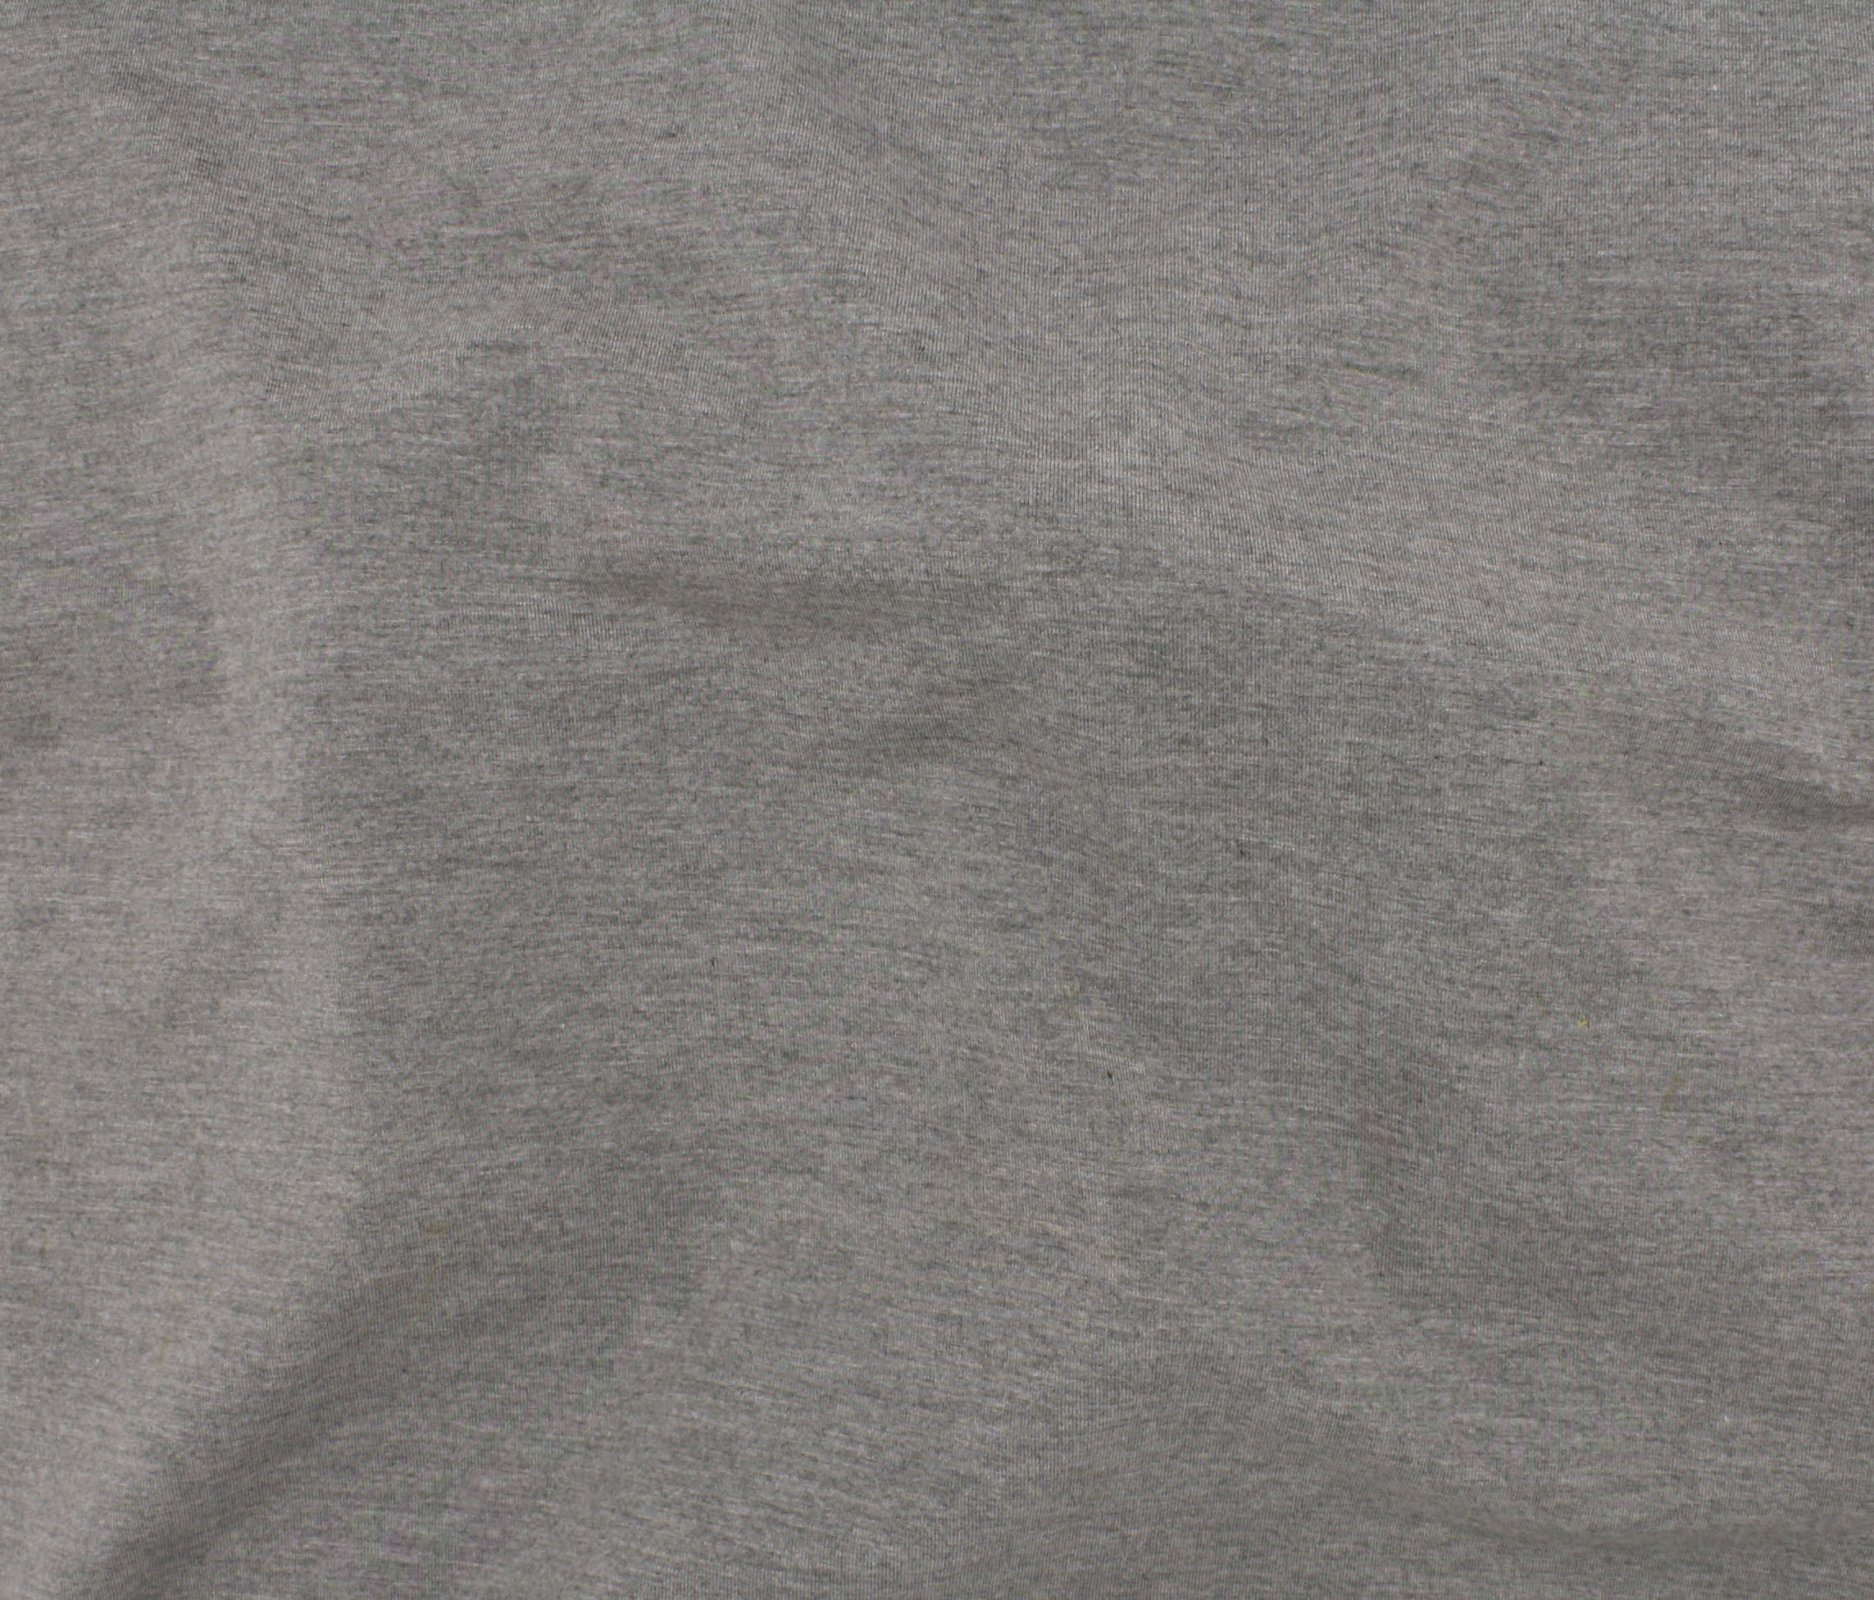 Bamboo 300 - Medium Heathered Grey